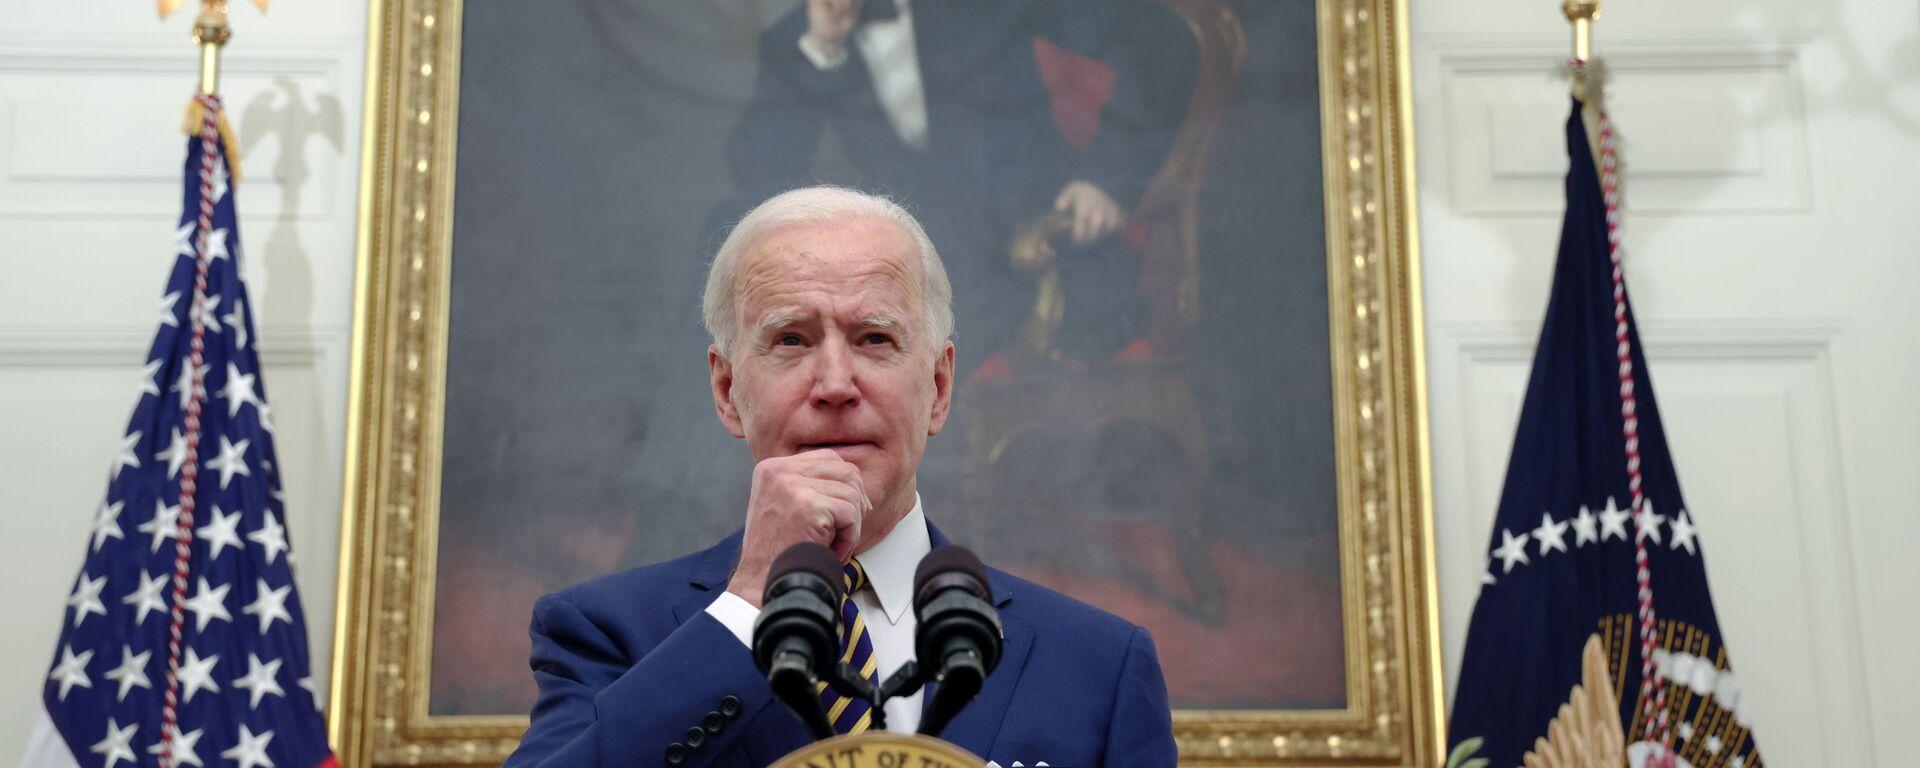 Joe Biden, presidente de EEUU  - Sputnik Mundo, 1920, 26.04.2021